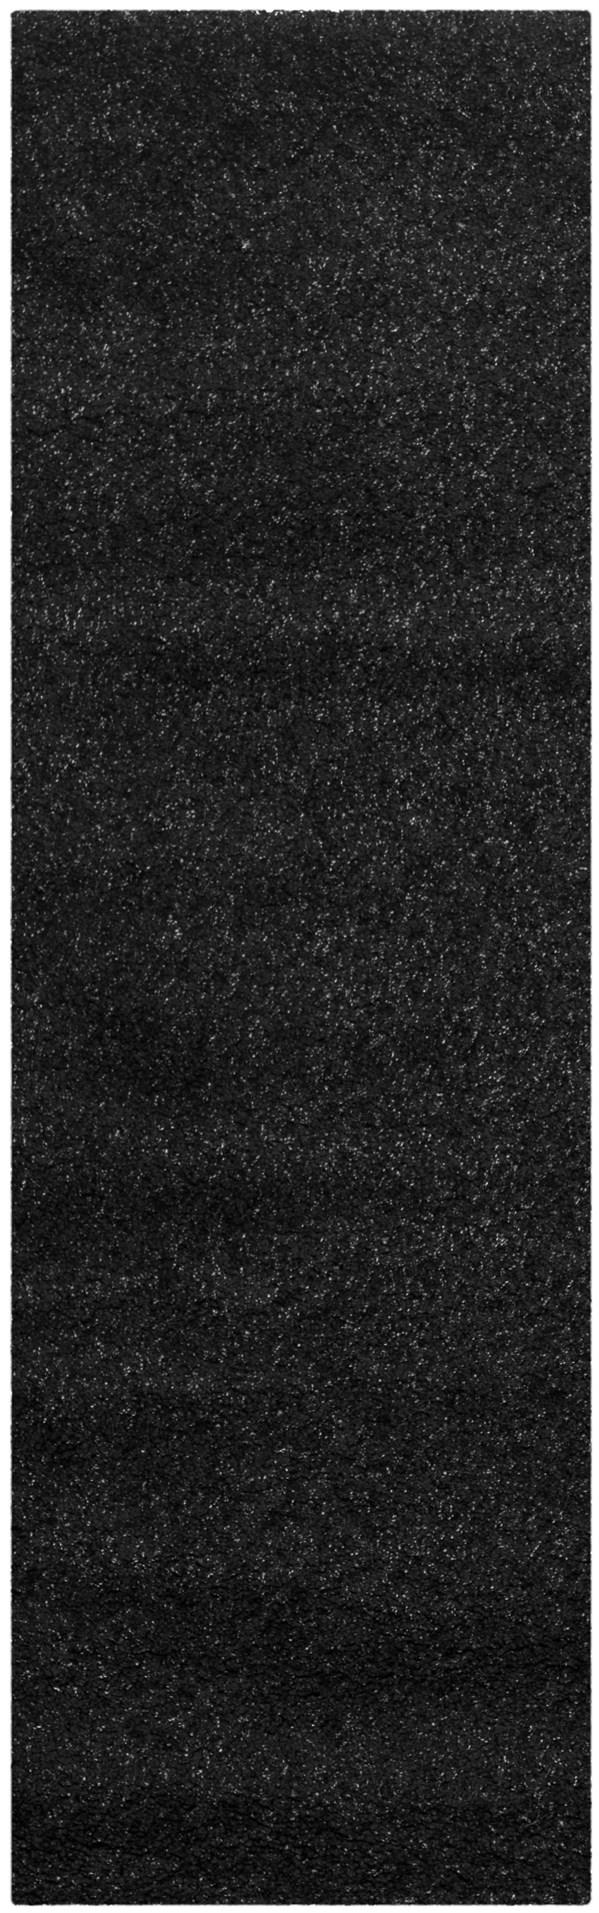 Black (9090) Solid Area Rug